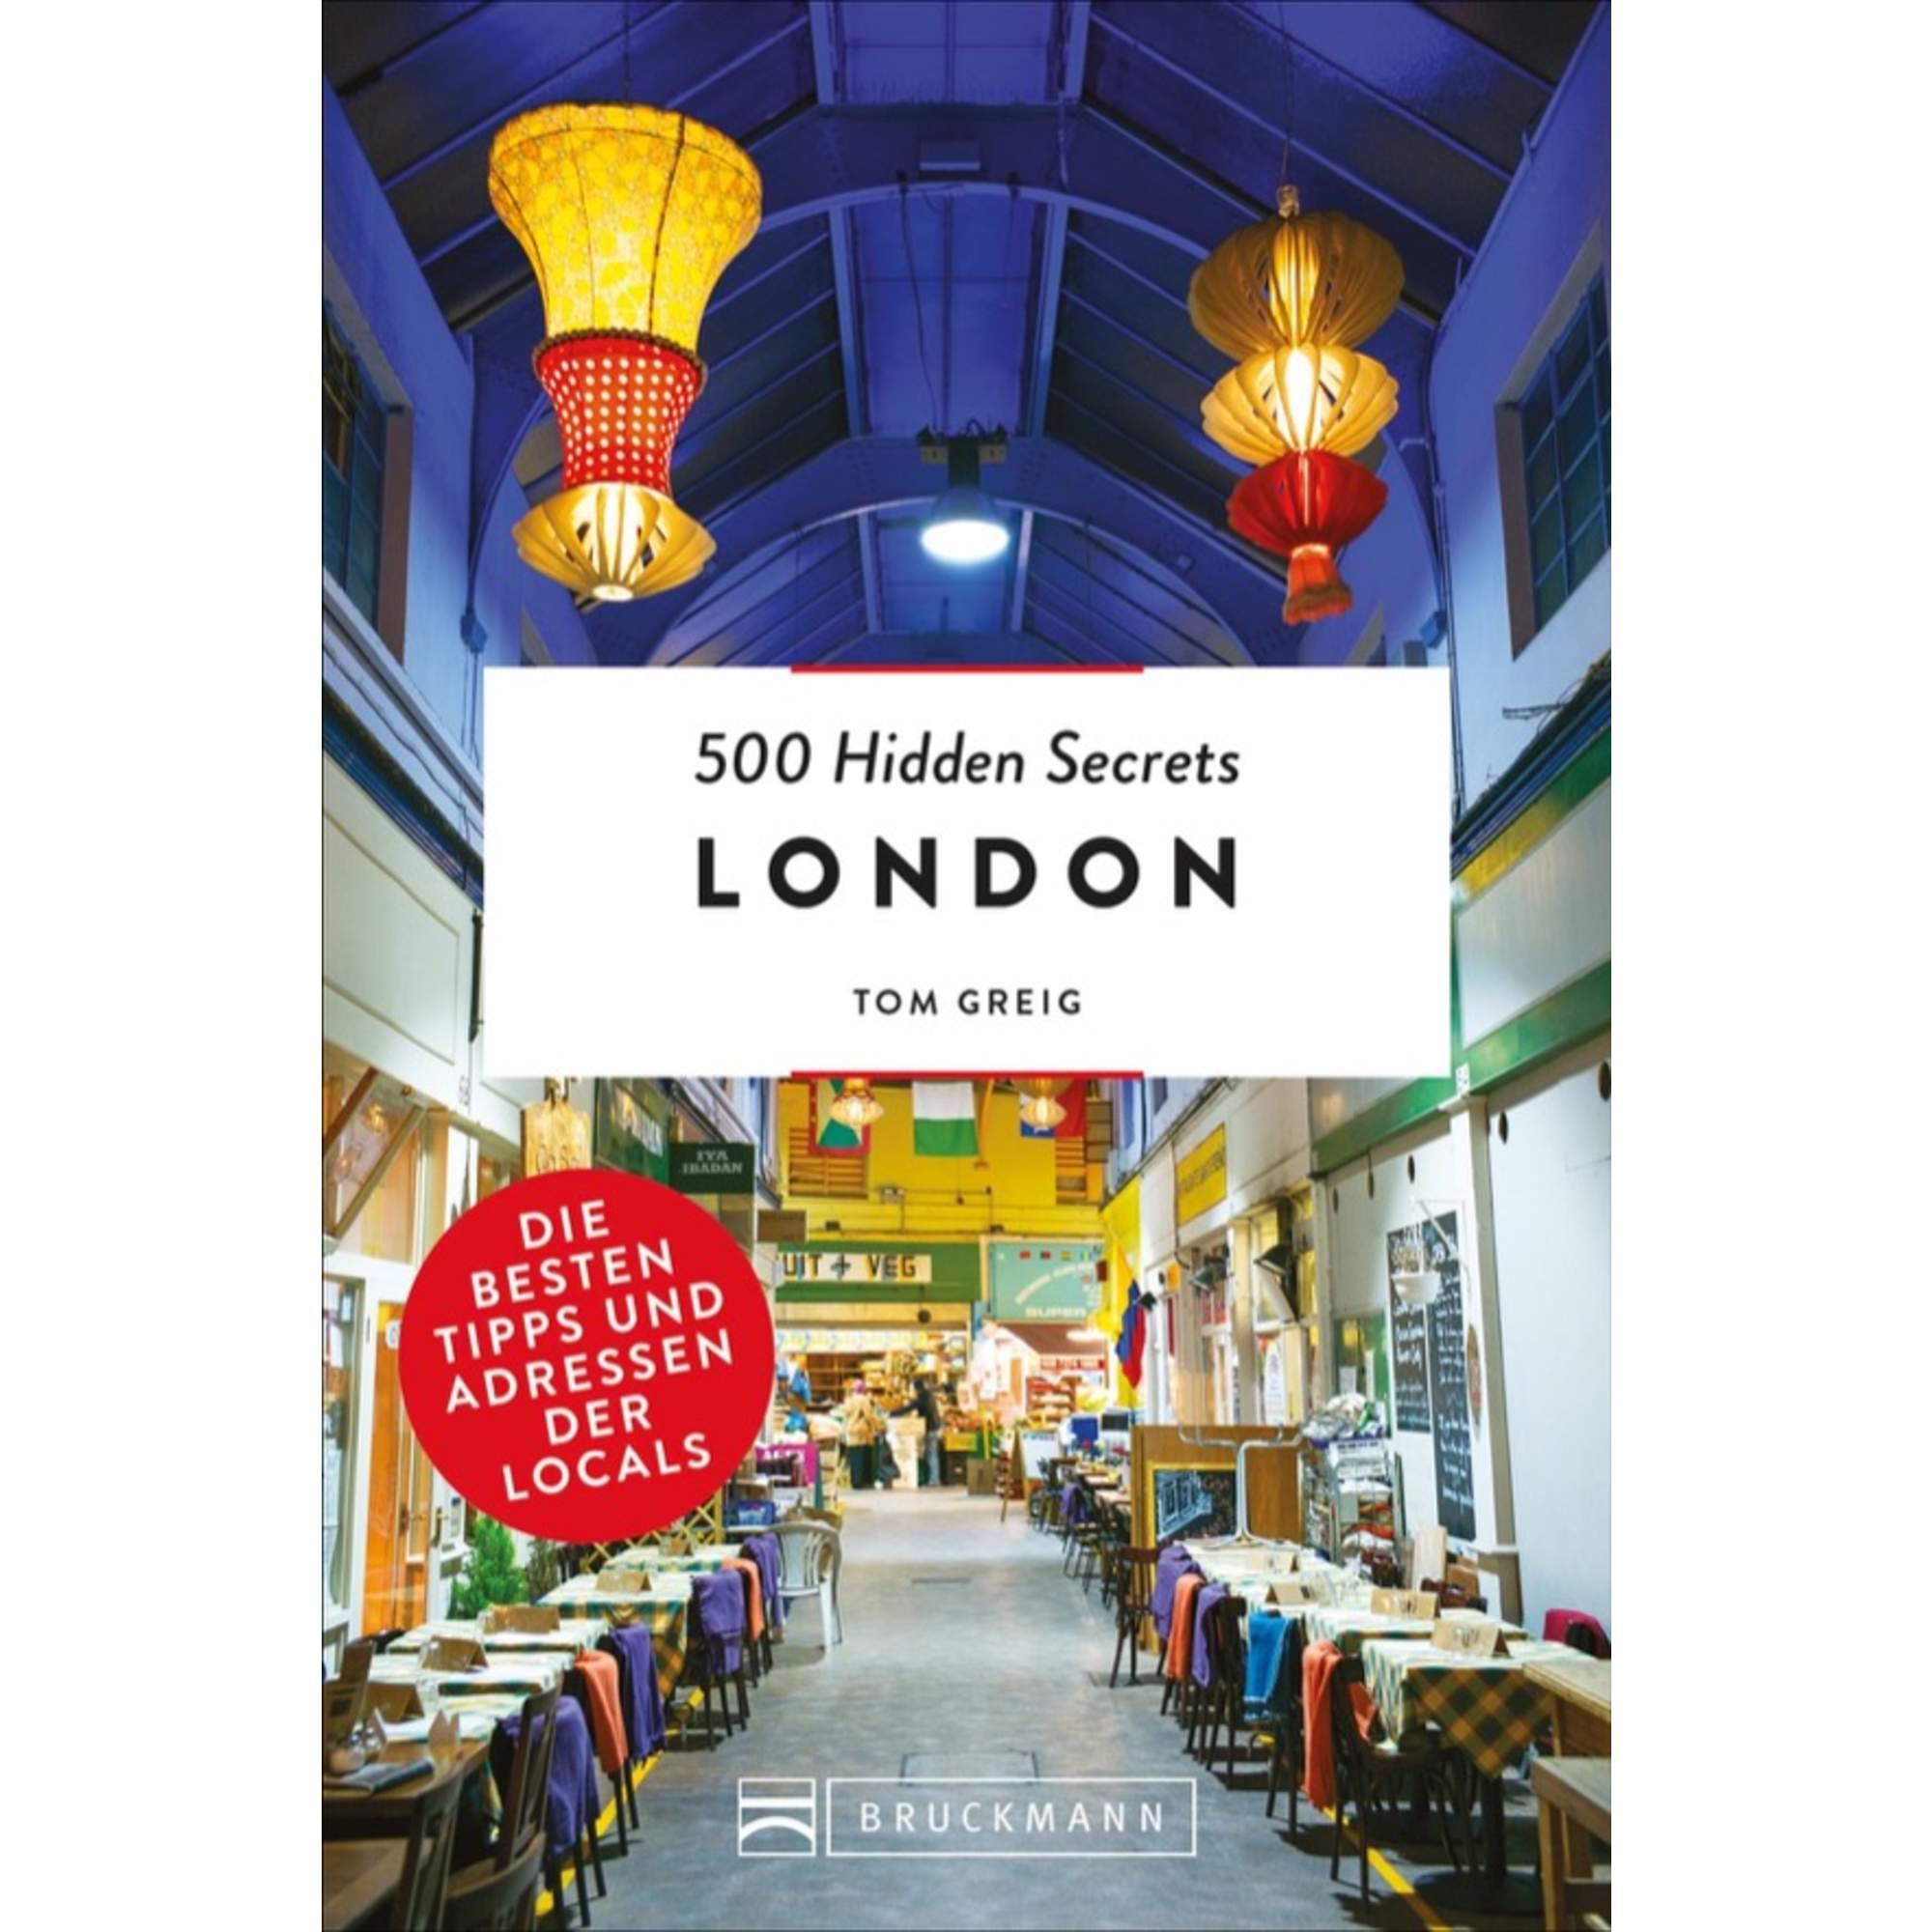 500 HIDDEN SECRETS LONDON, 16,99 Euro